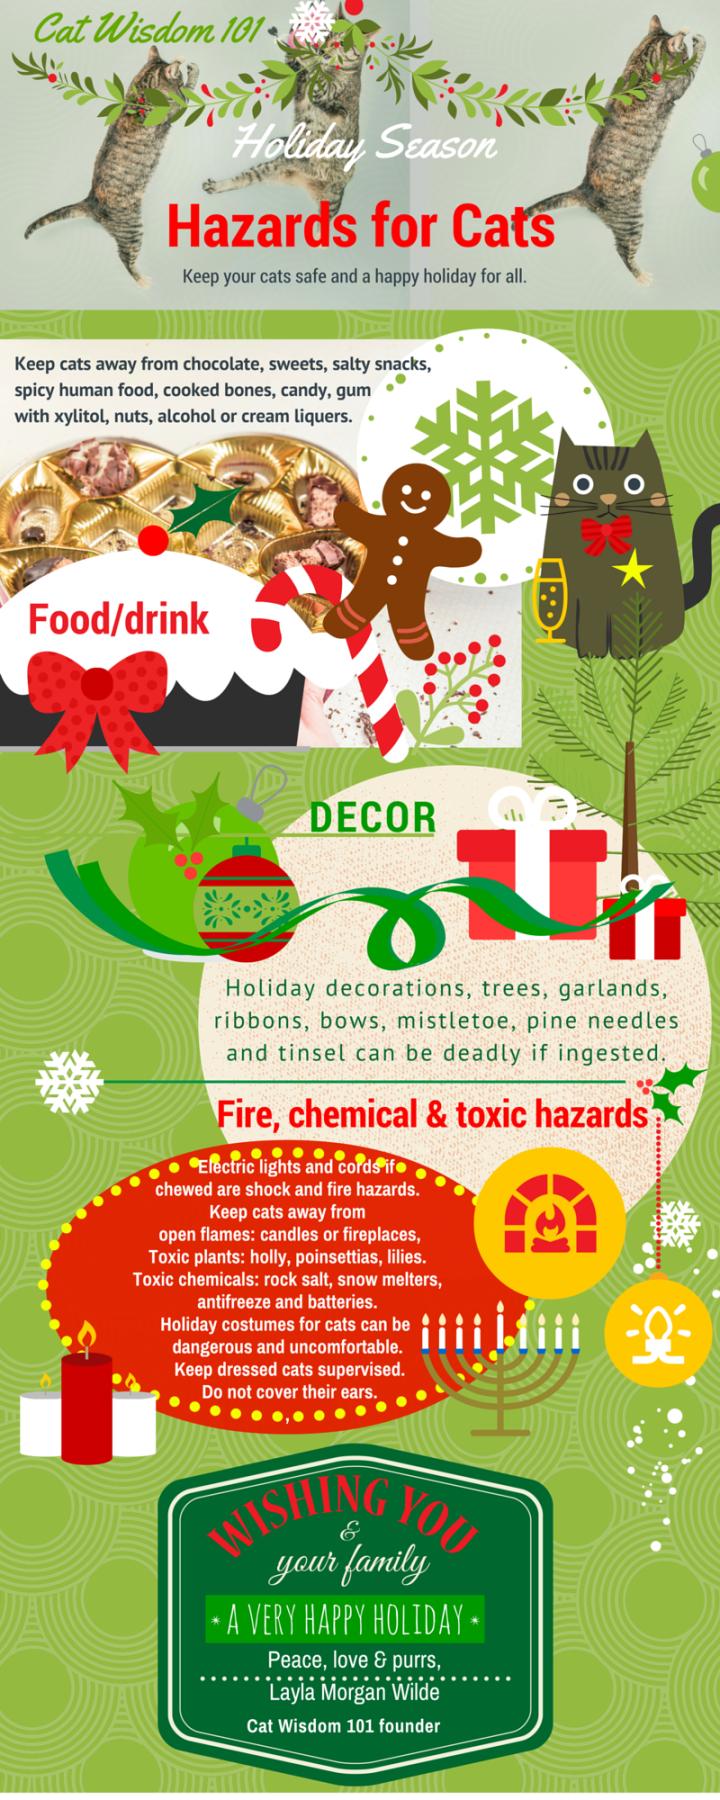 cat wisdom 101 holiday cat hazards infographic